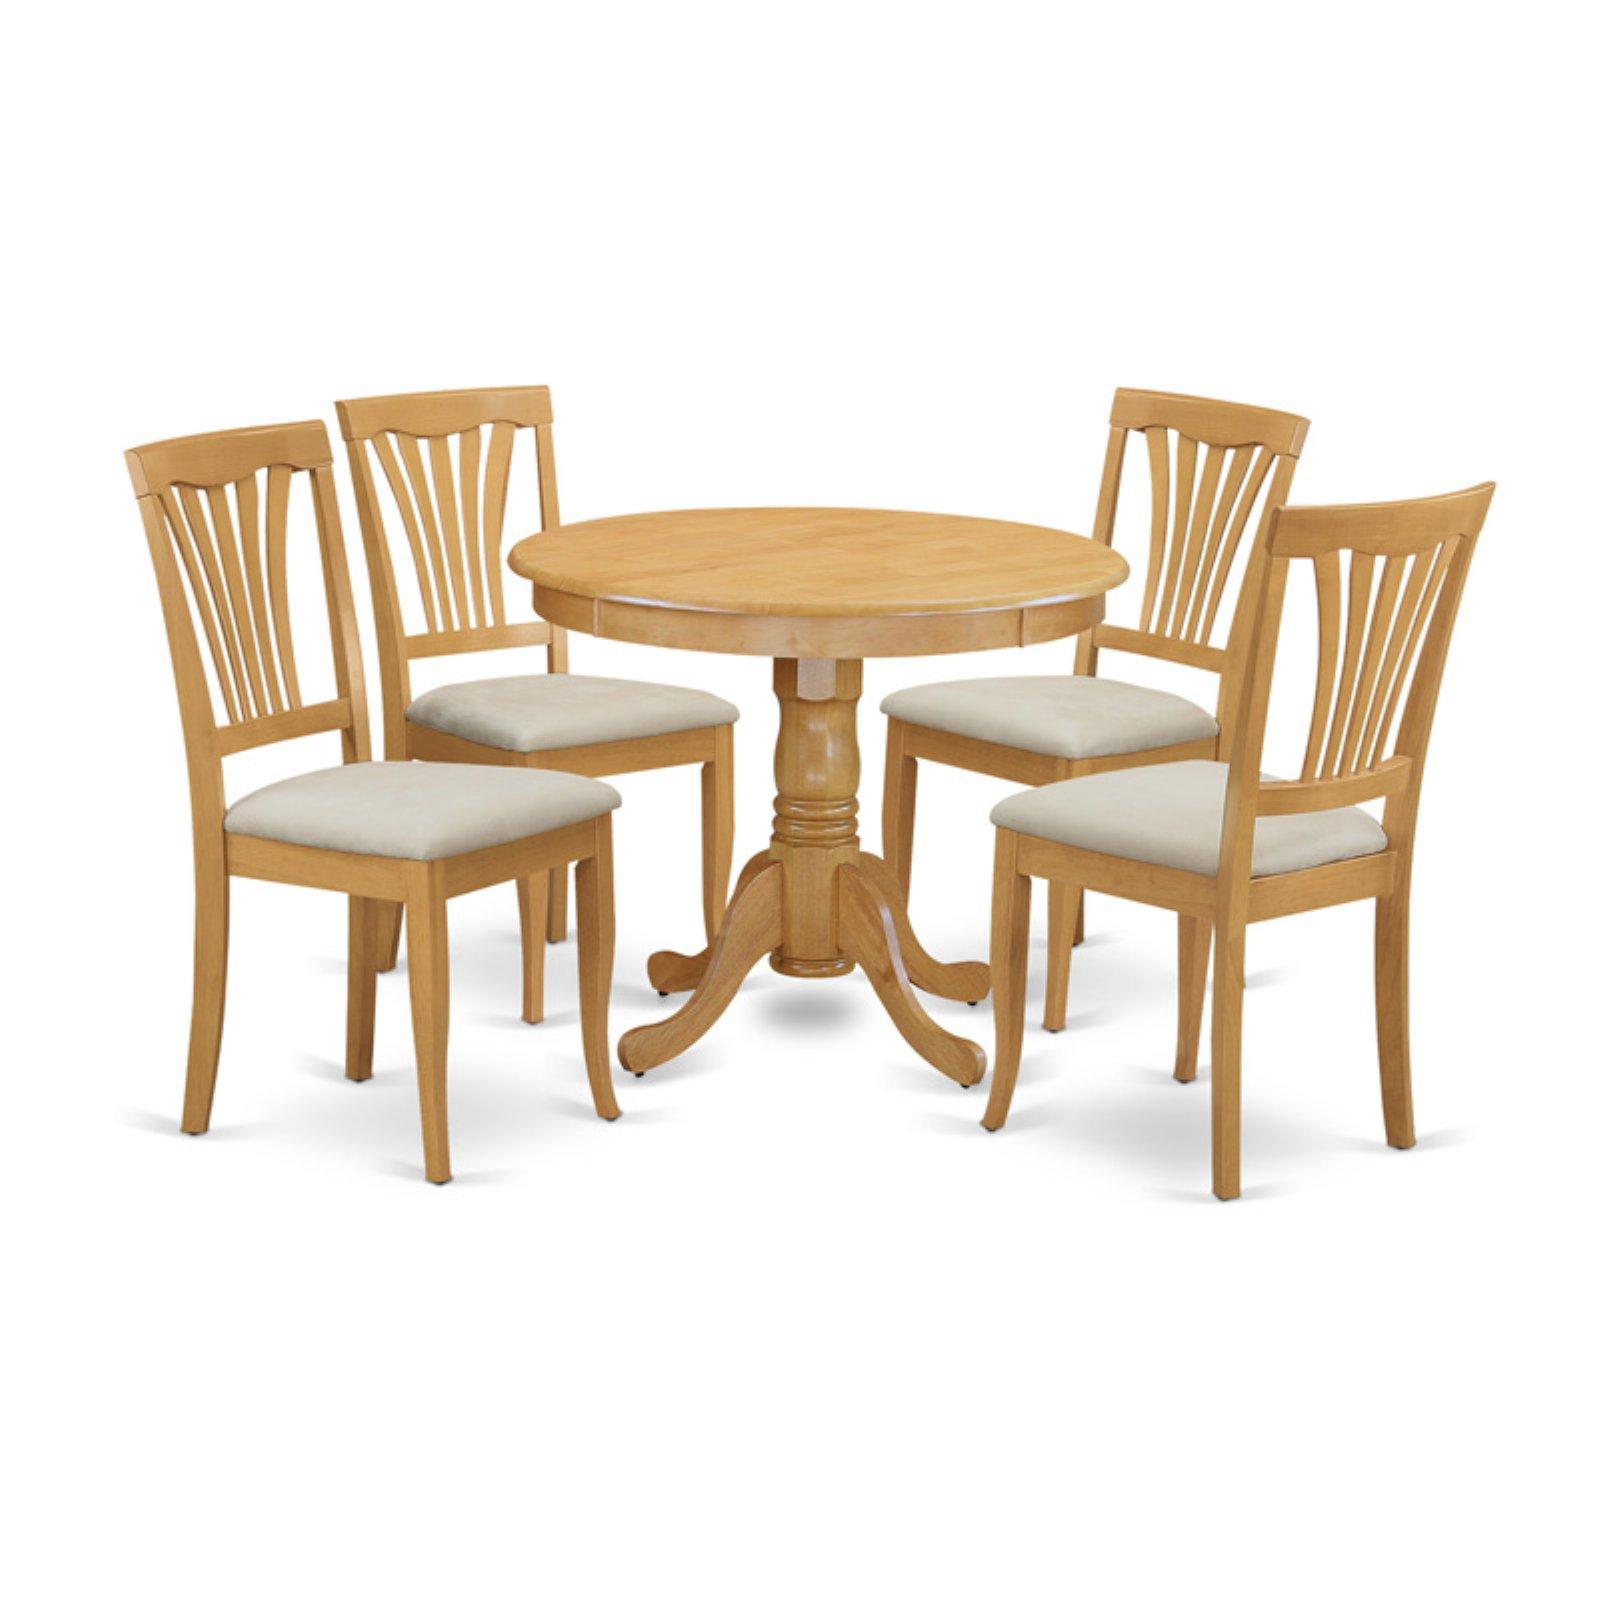 East West Furniture 5 Piece Lath Back Kitchen Dinette Dining Table Set